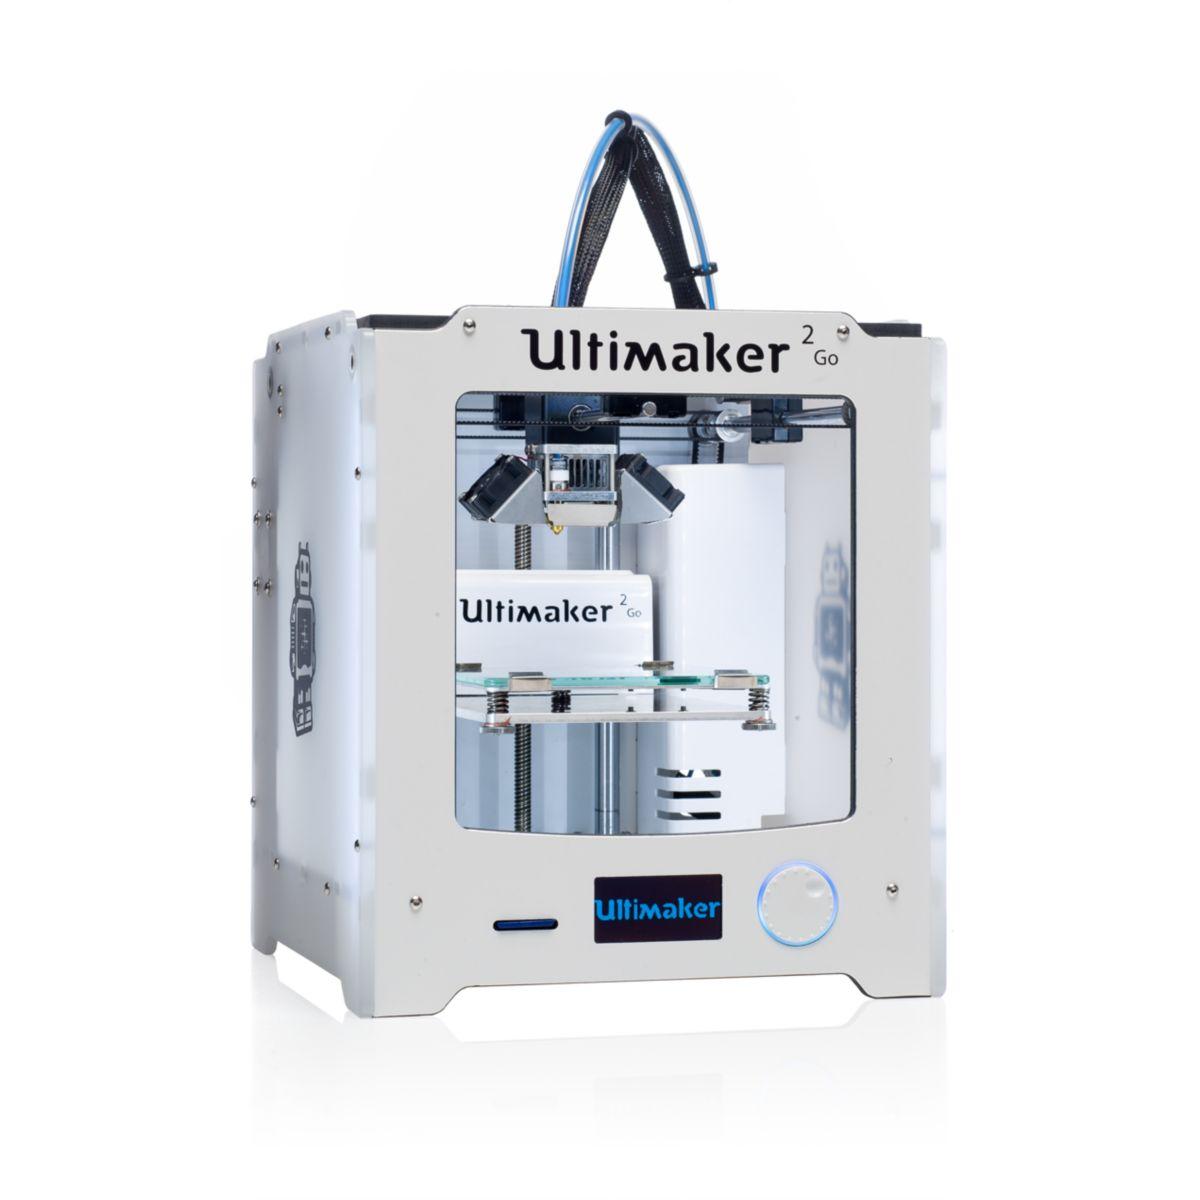 Imprimante ESSENTIELB Ultimaker 2Go (photo)